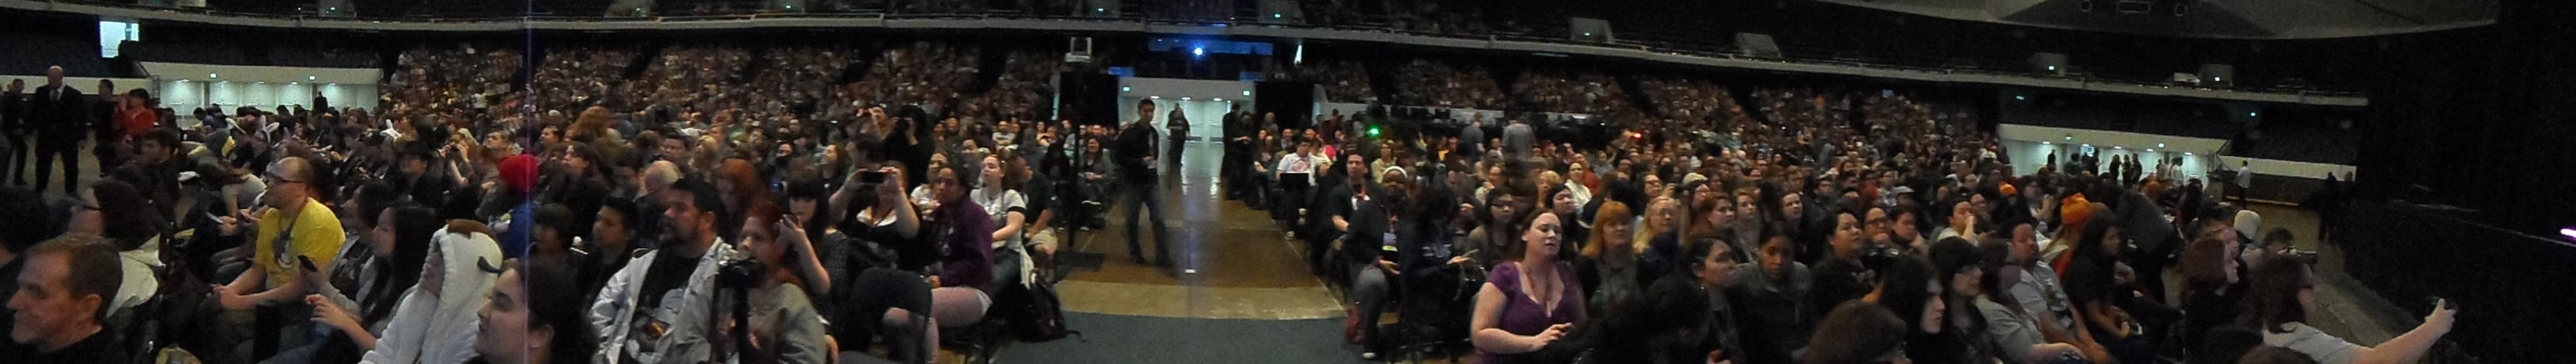 Wondercon Anaheim 2013: The Sunday Audience